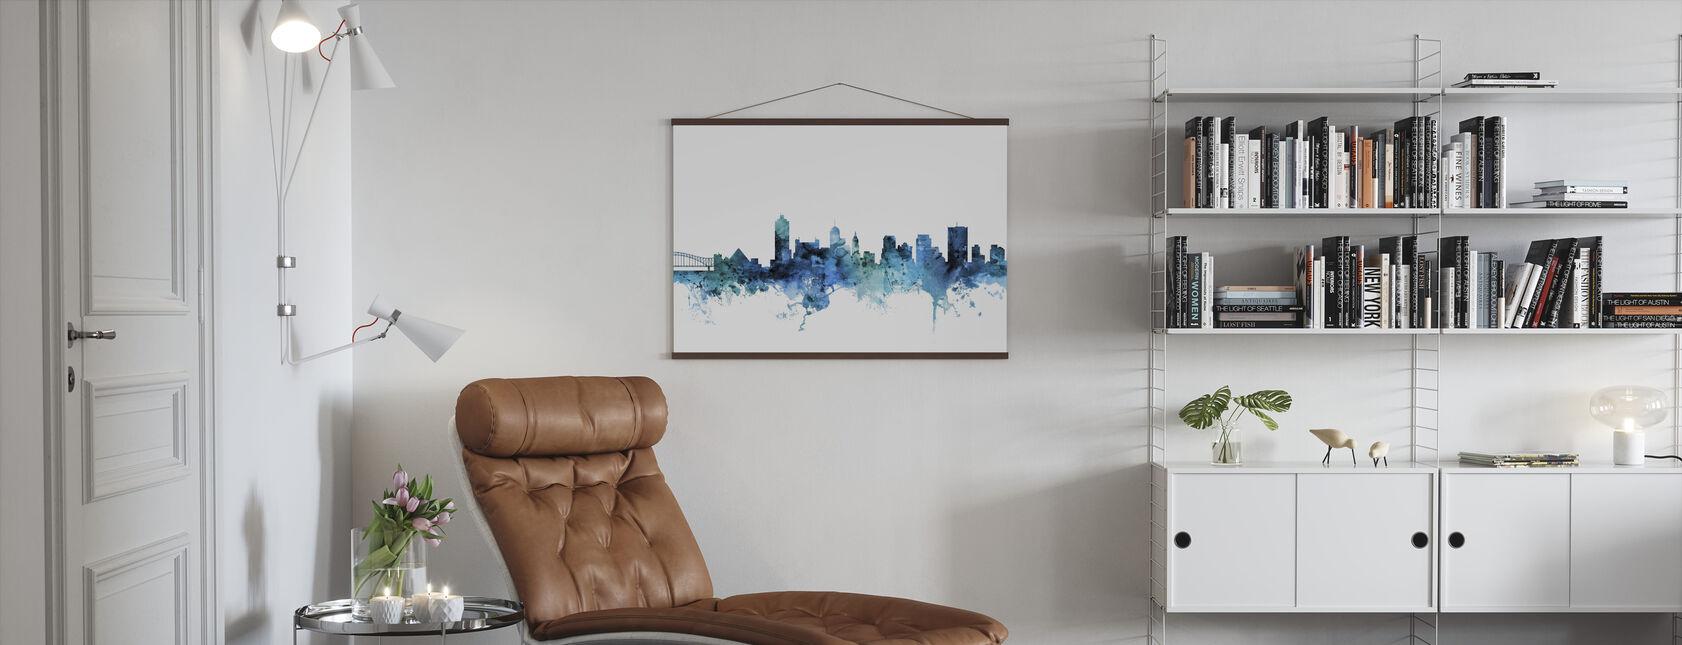 Memphis Tennessee Skyline - Poster - Living Room